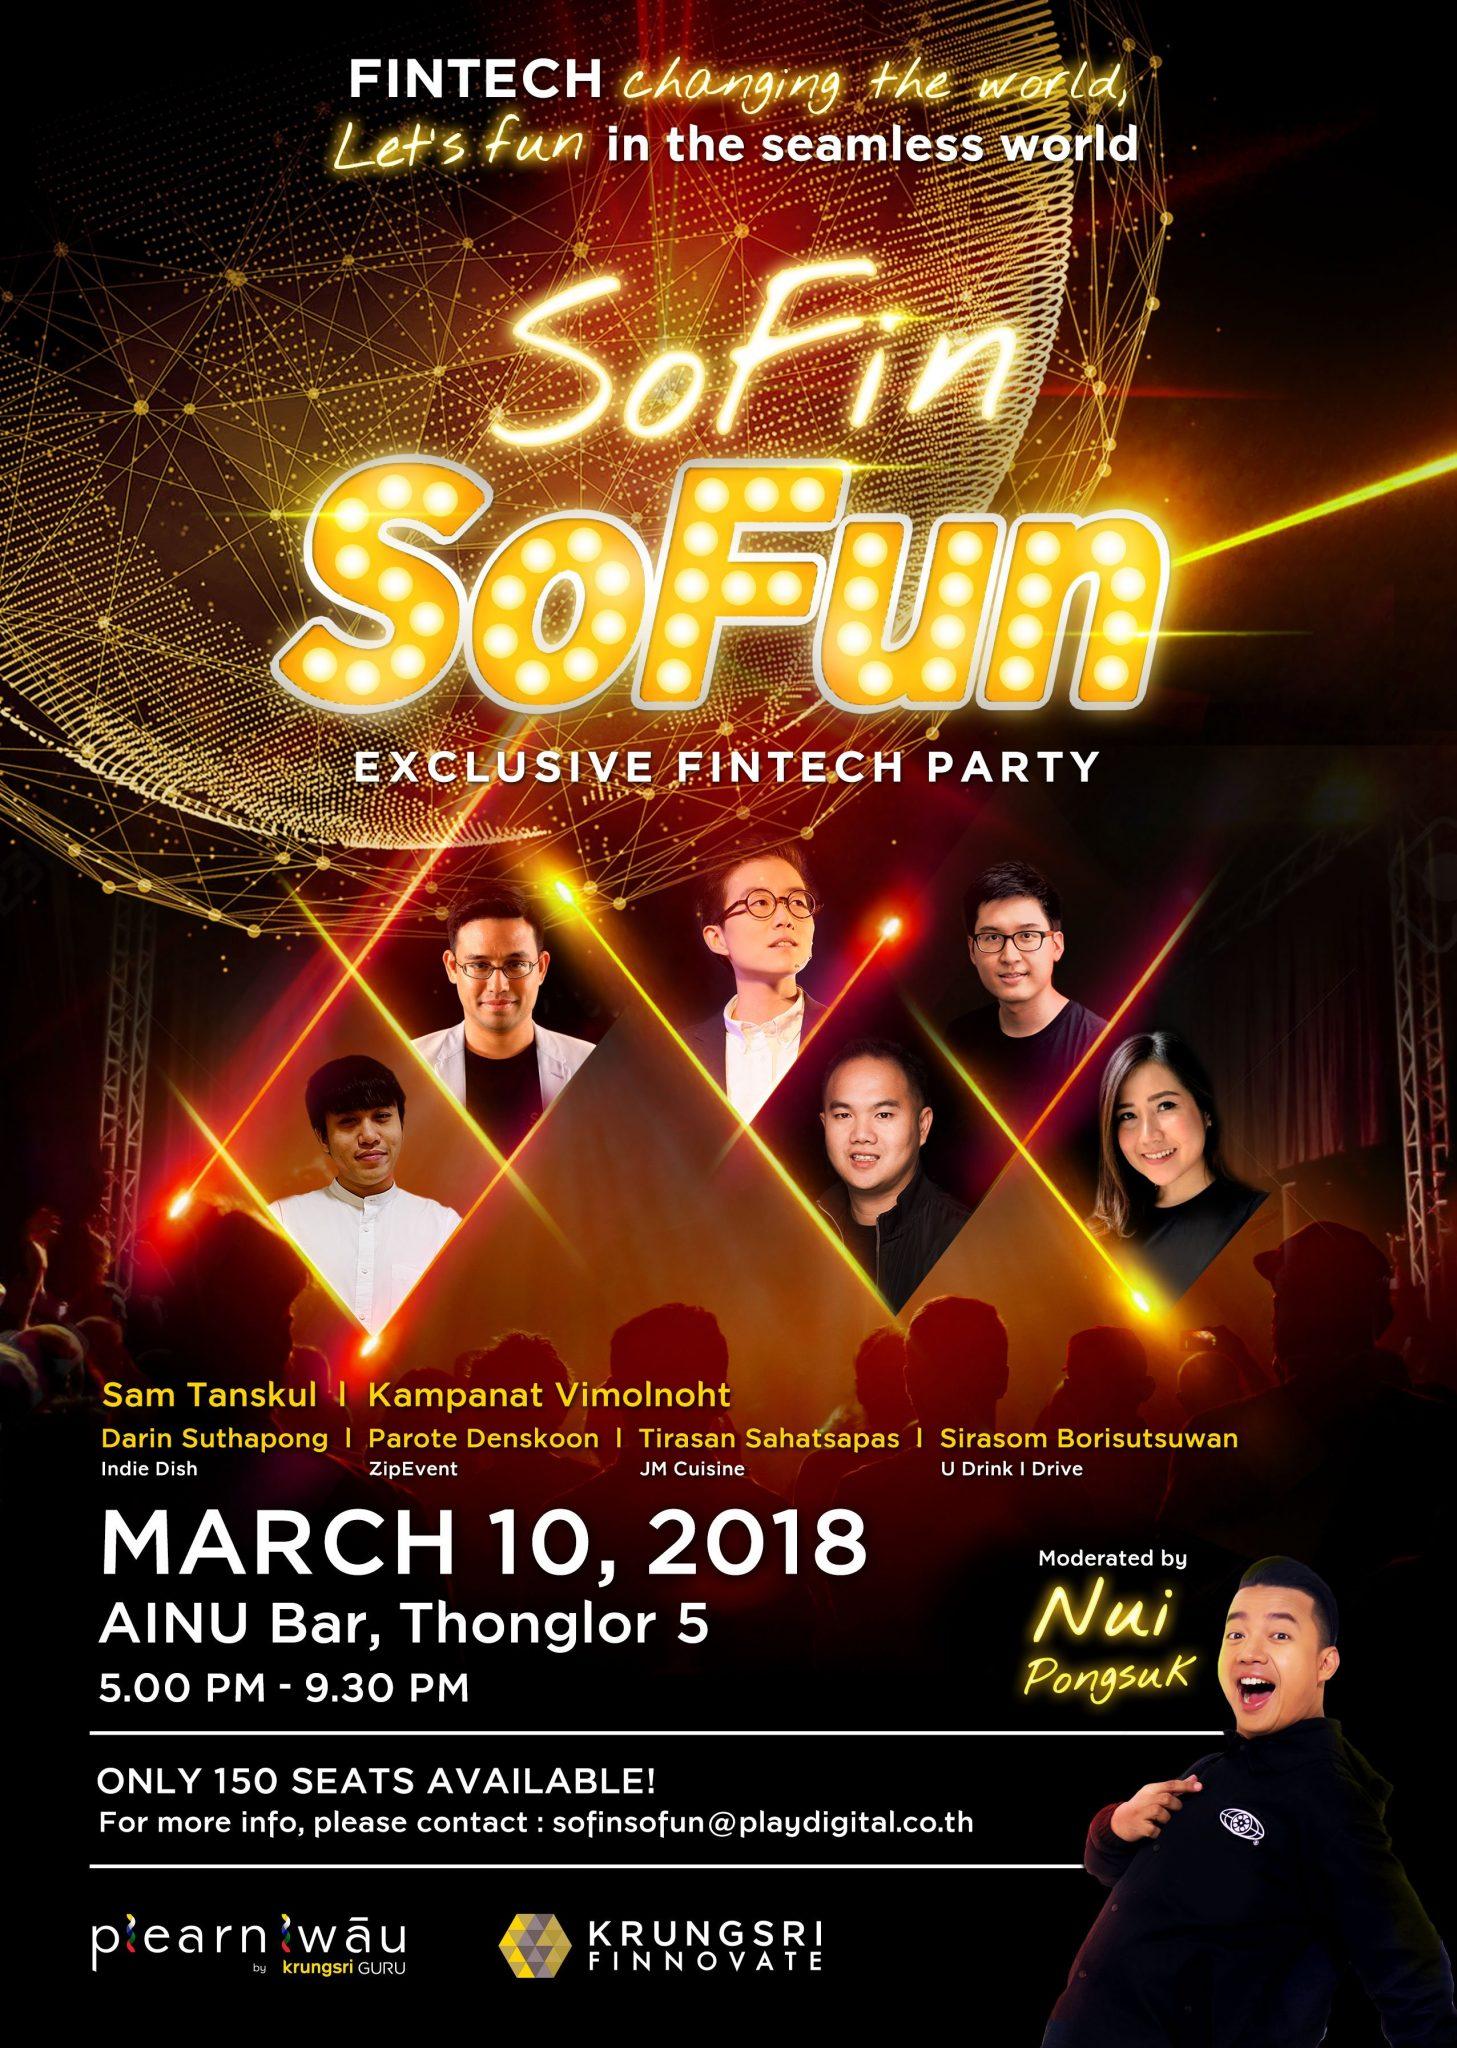 SoFin SoFun ปาร์ตี้ FinTech สนุกสุดฟินแห่งปีที่ทุกคนรอคอย